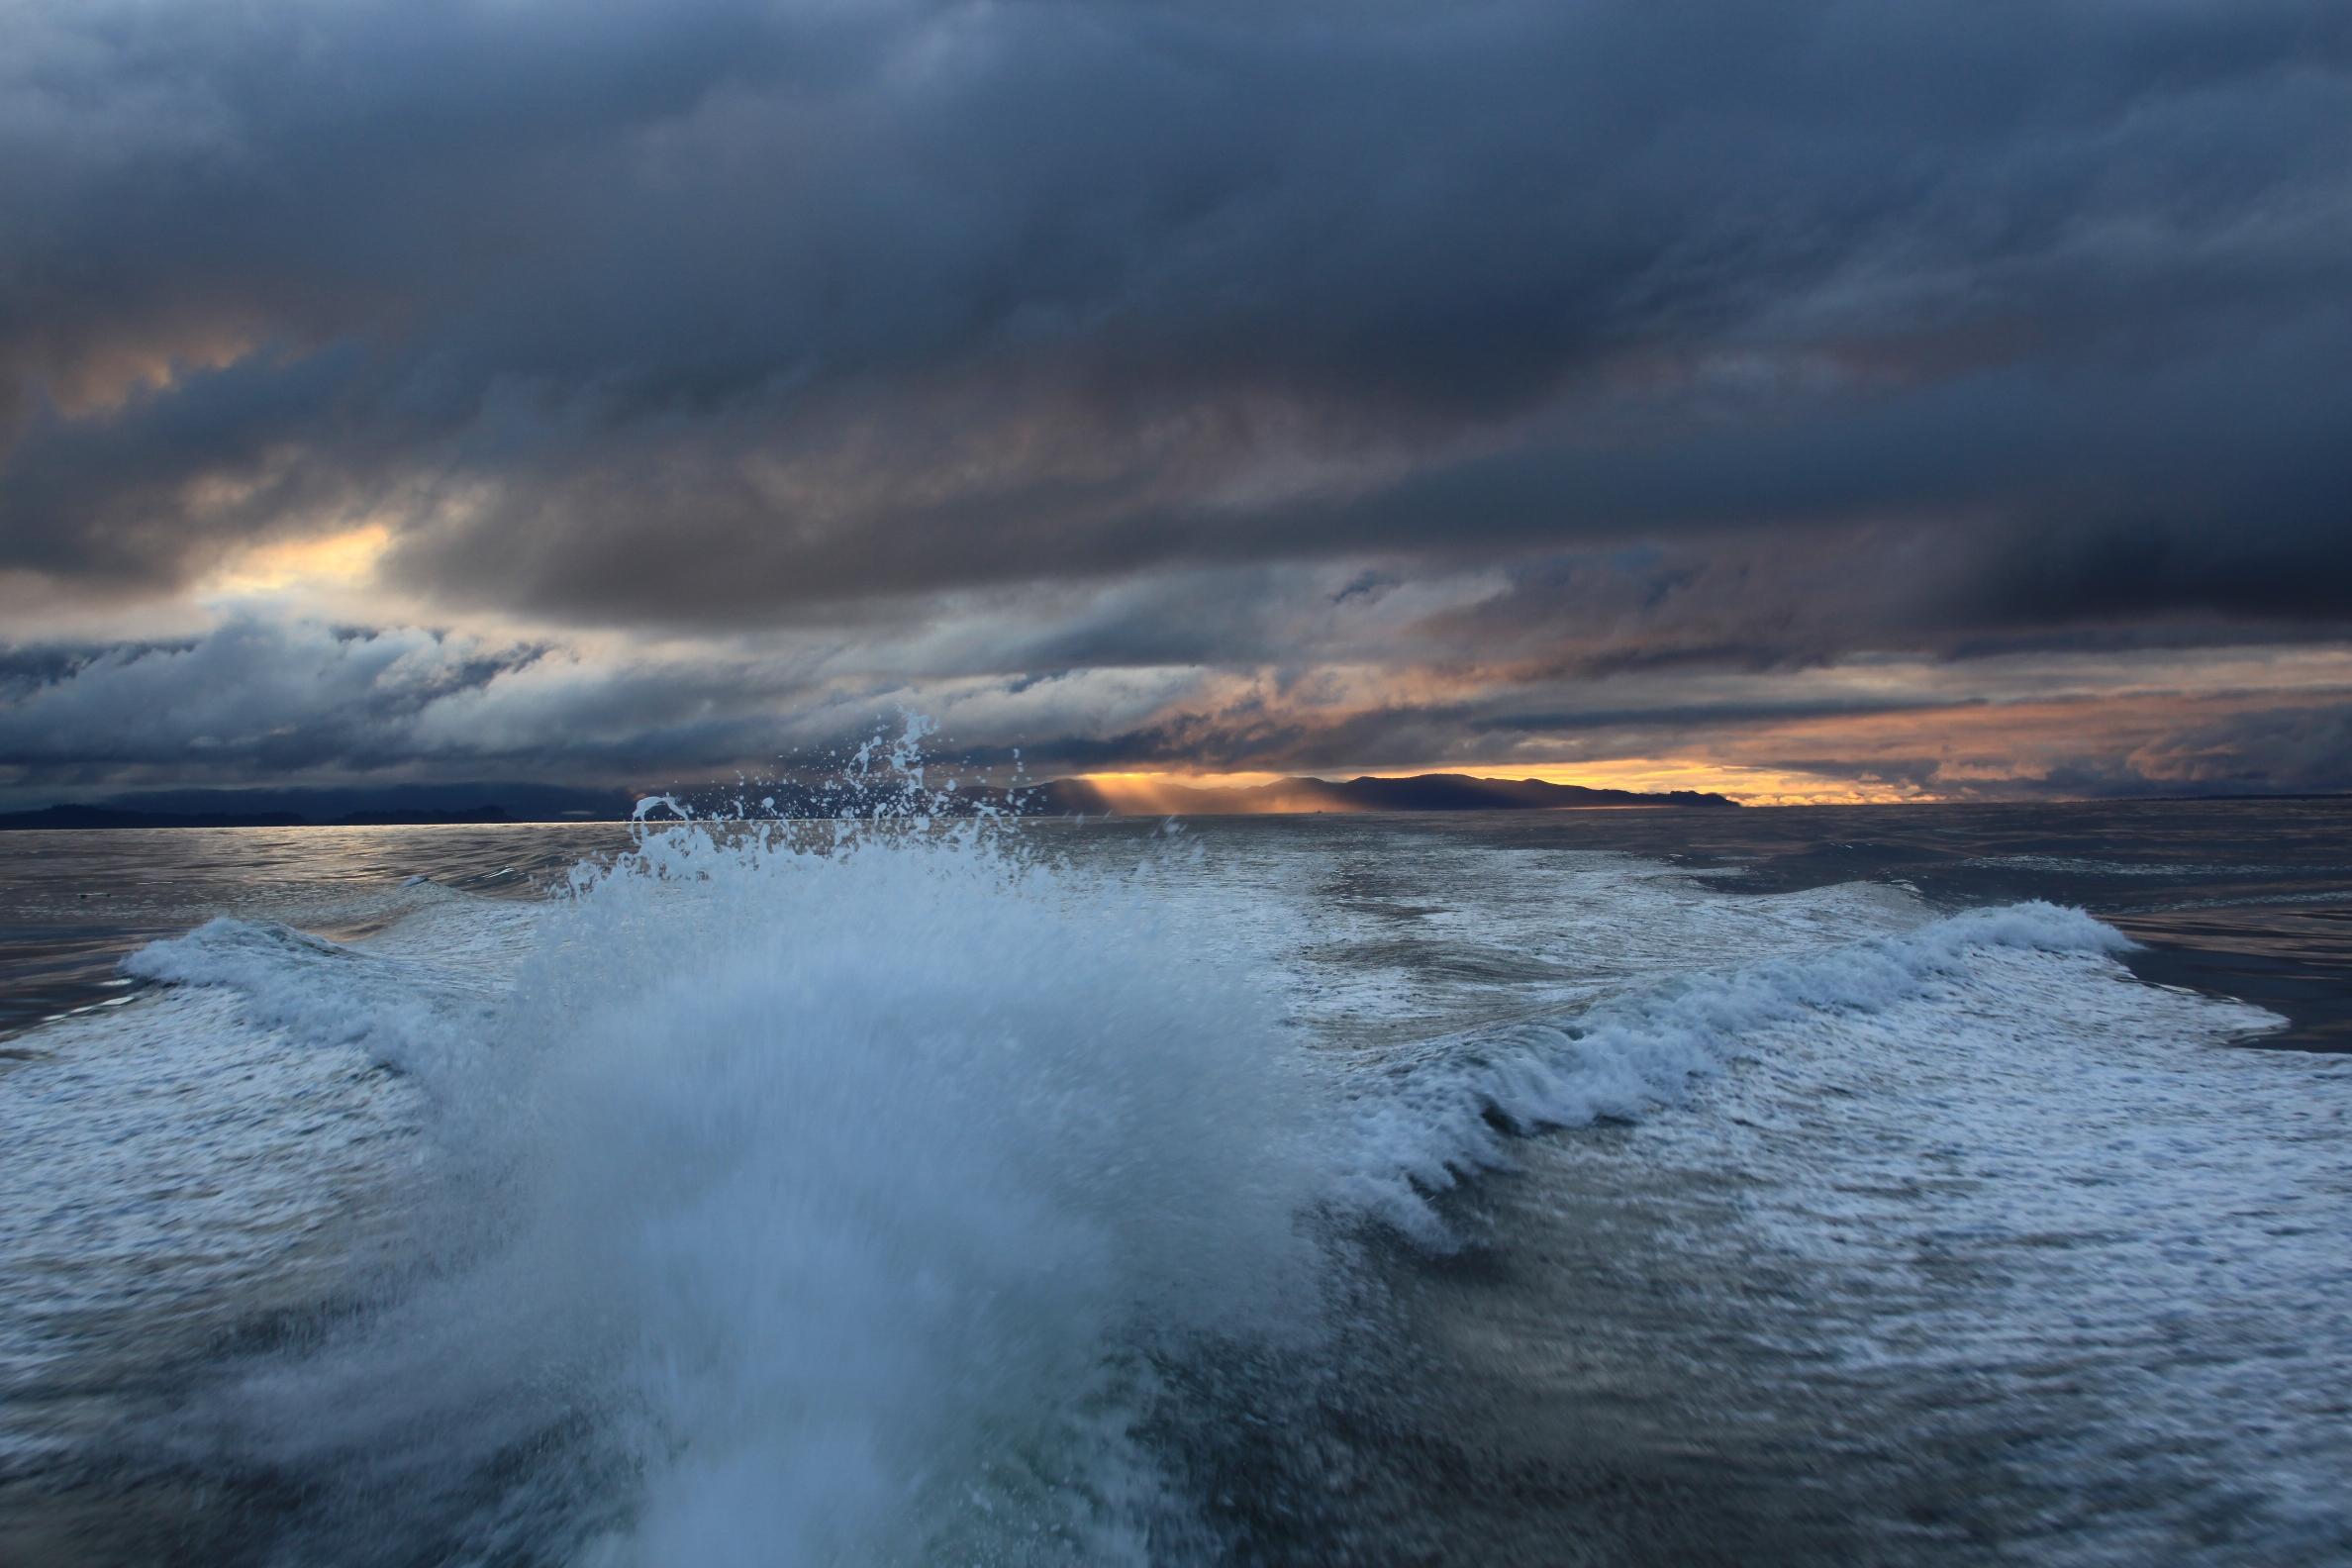 Tuna Dog Offshore Blog